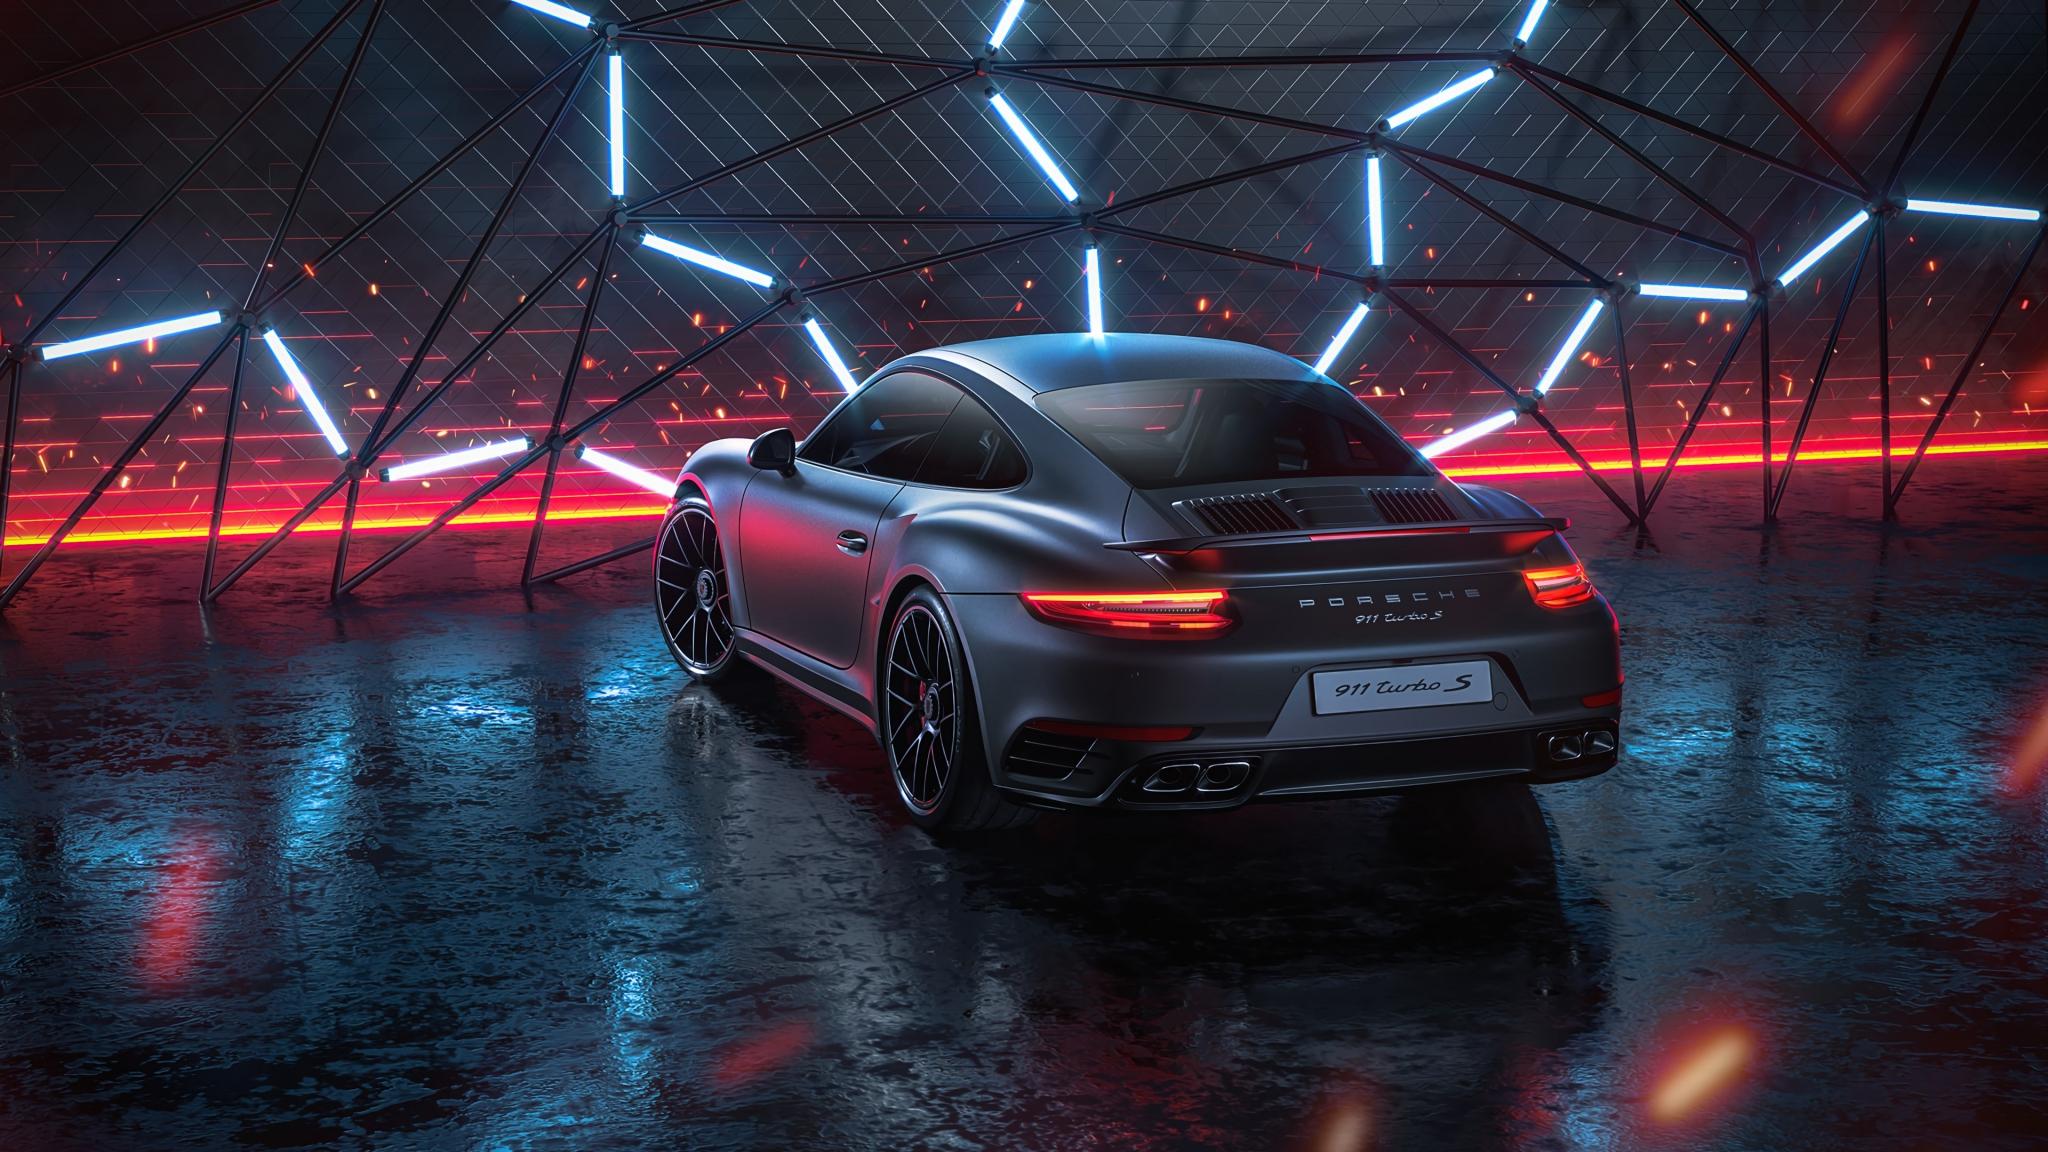 Download 2048x1152 Wallpaper Porsche 911 Turbo S Porsche Car Art Dual Wide Widescreen 2048x1152 Hd Image Background 23225